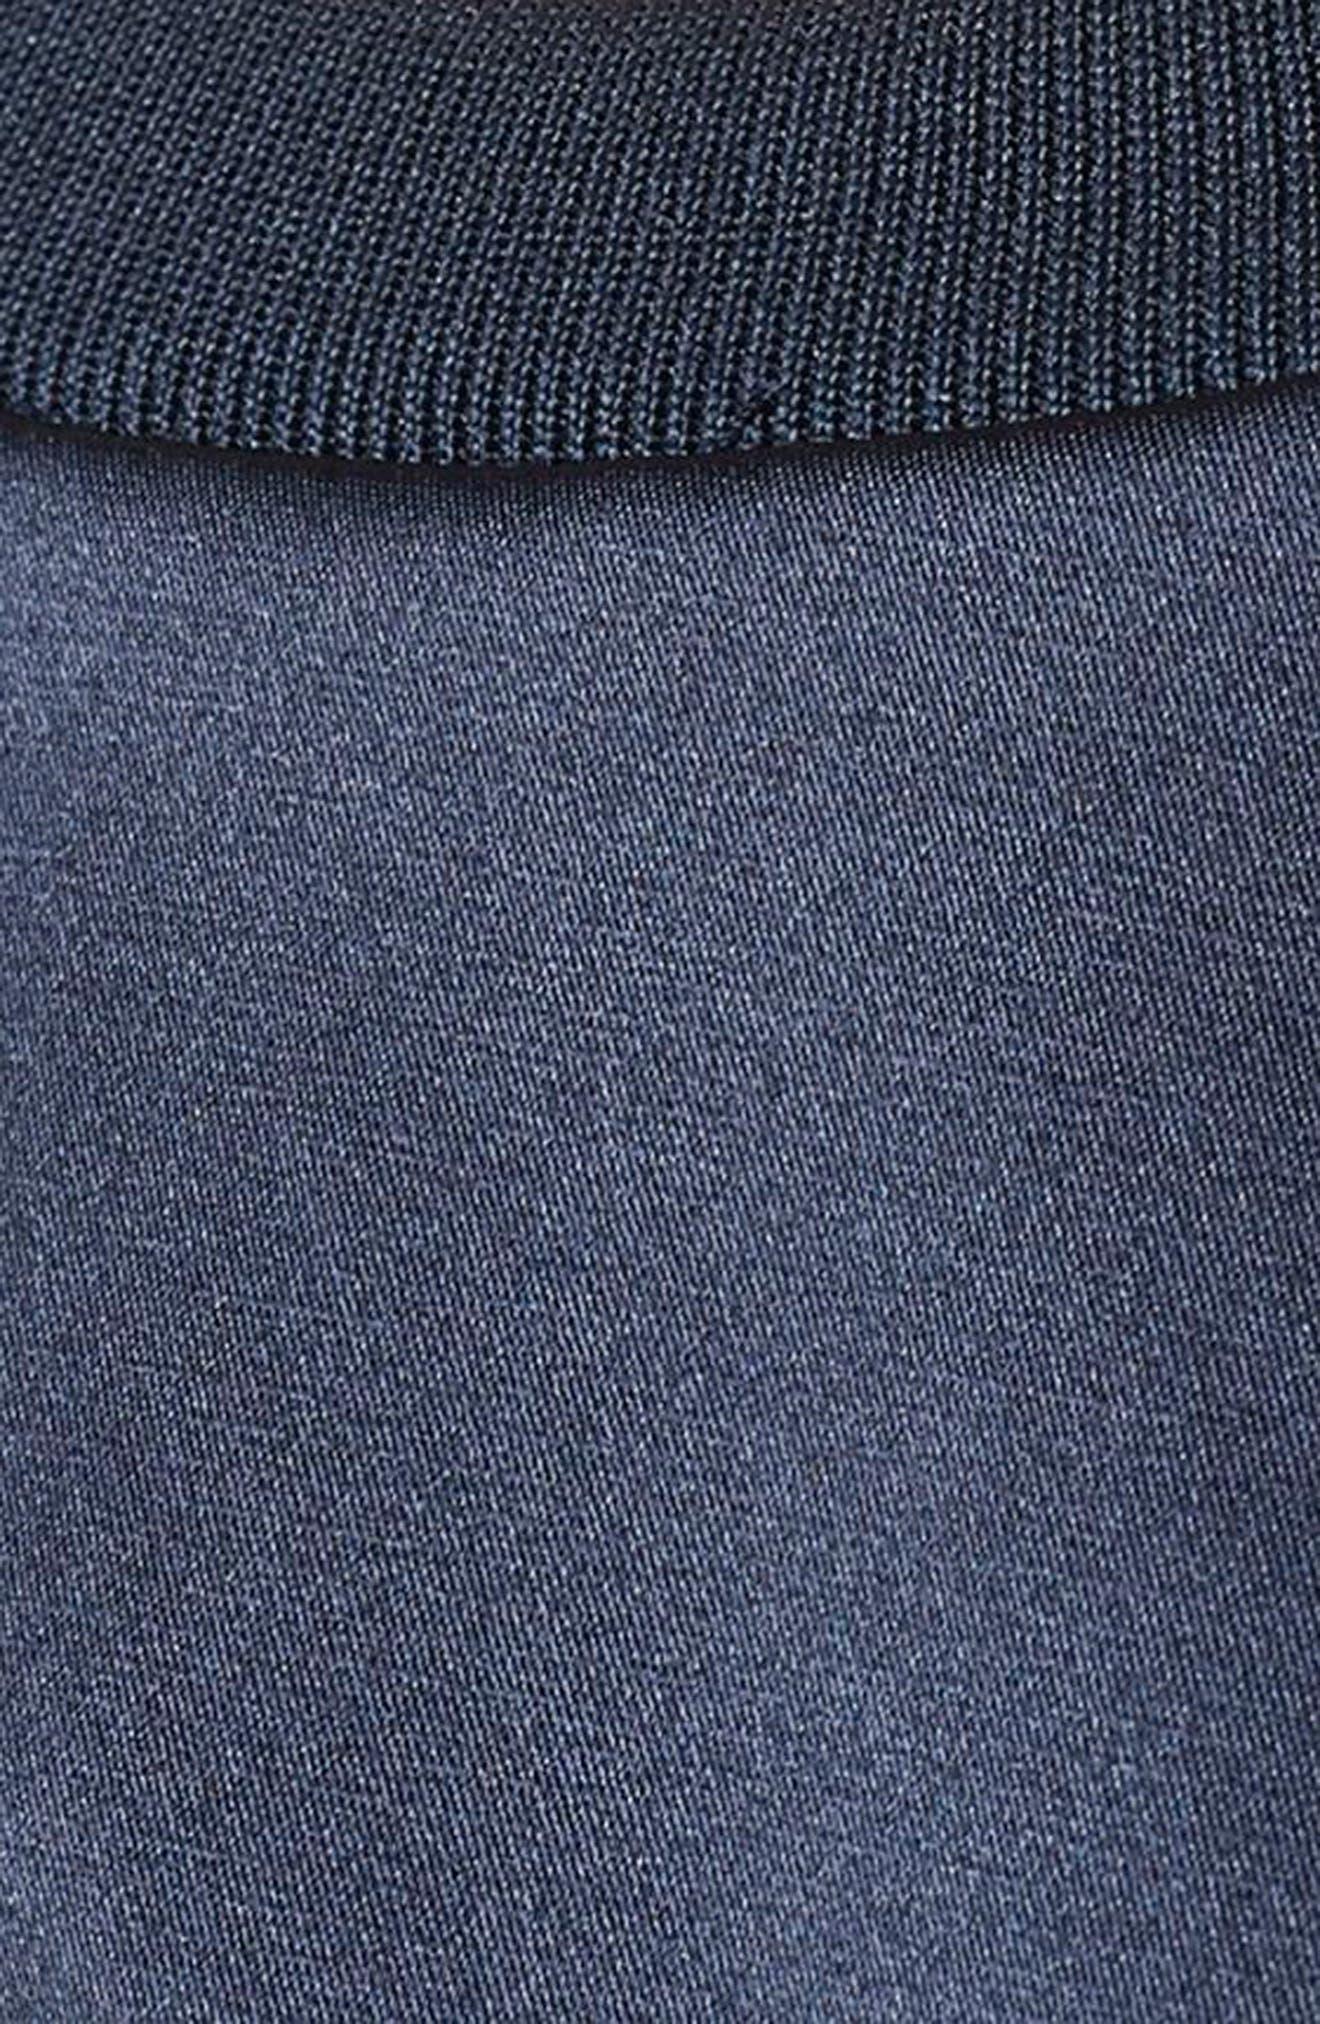 Trefoil Crewneck Sweater,                             Alternate thumbnail 6, color,                             408